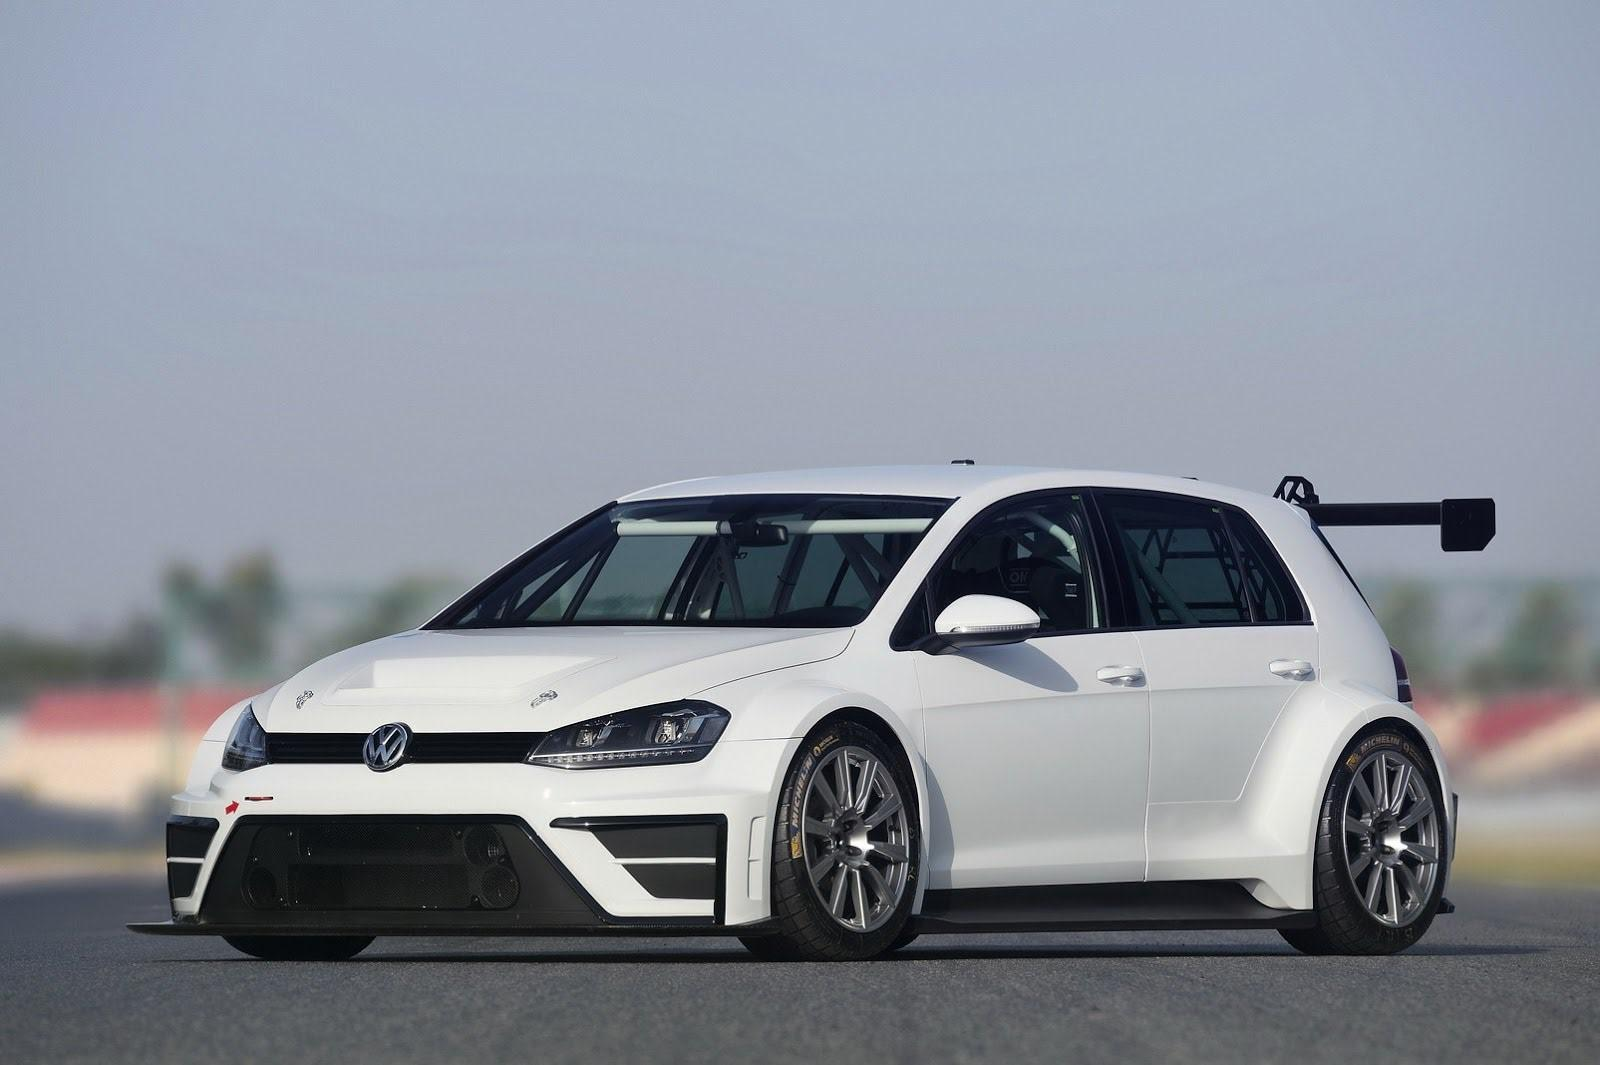 bennani-pilotera-la-voiture-championne-en-titre-tcr-619-1.jpg